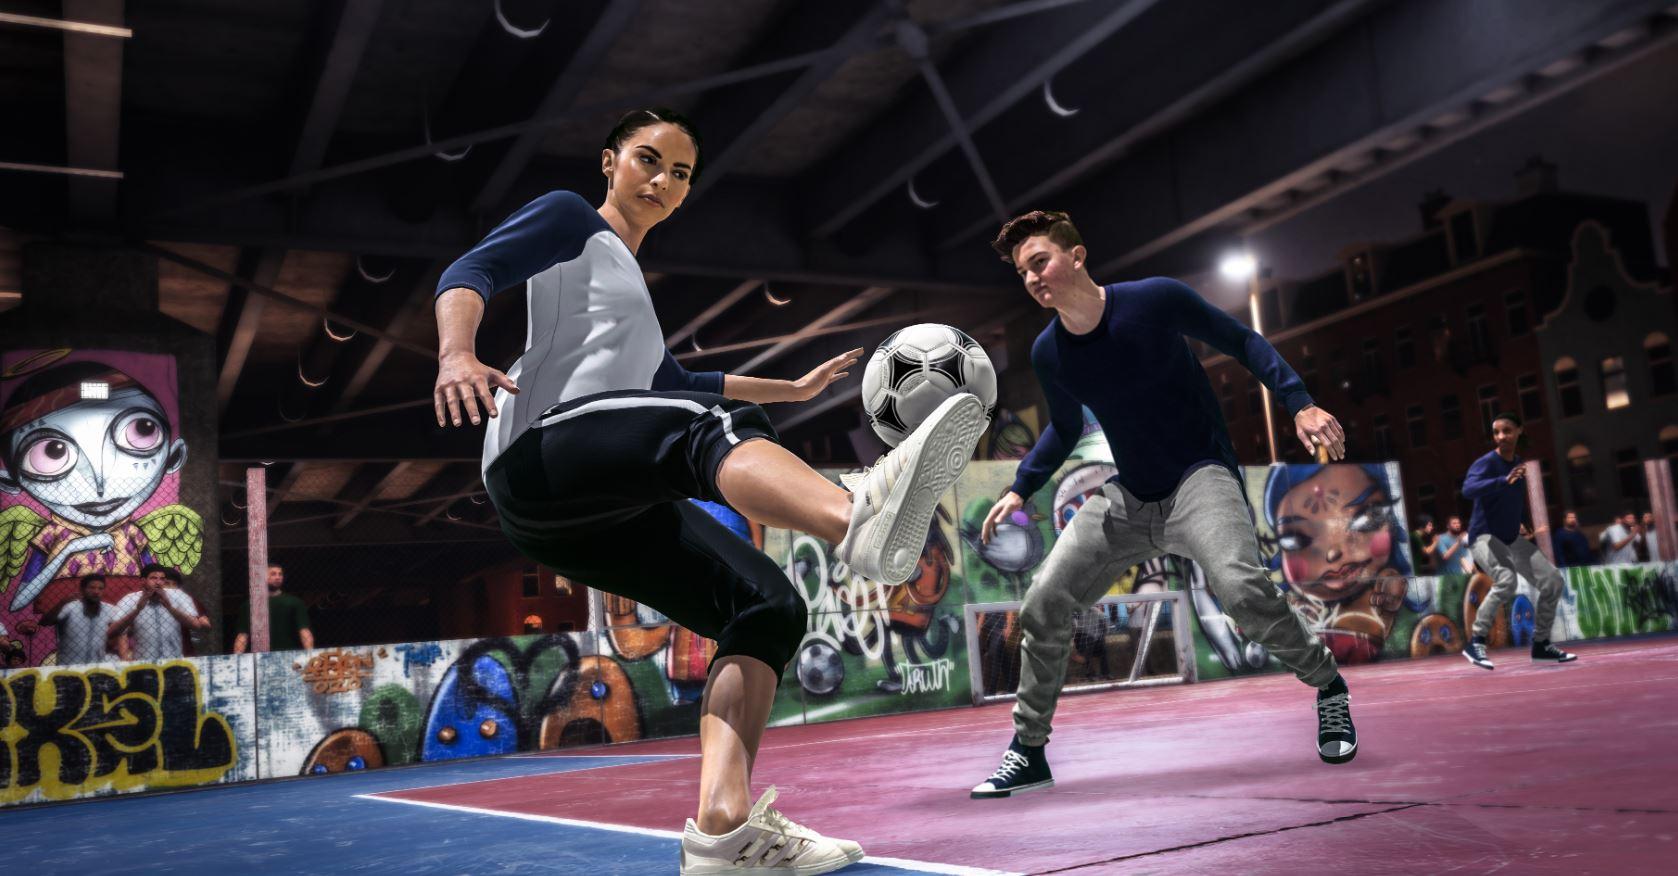 EA's Federation Internationale de Football Association 20 Web App goes live ahead of EA Access